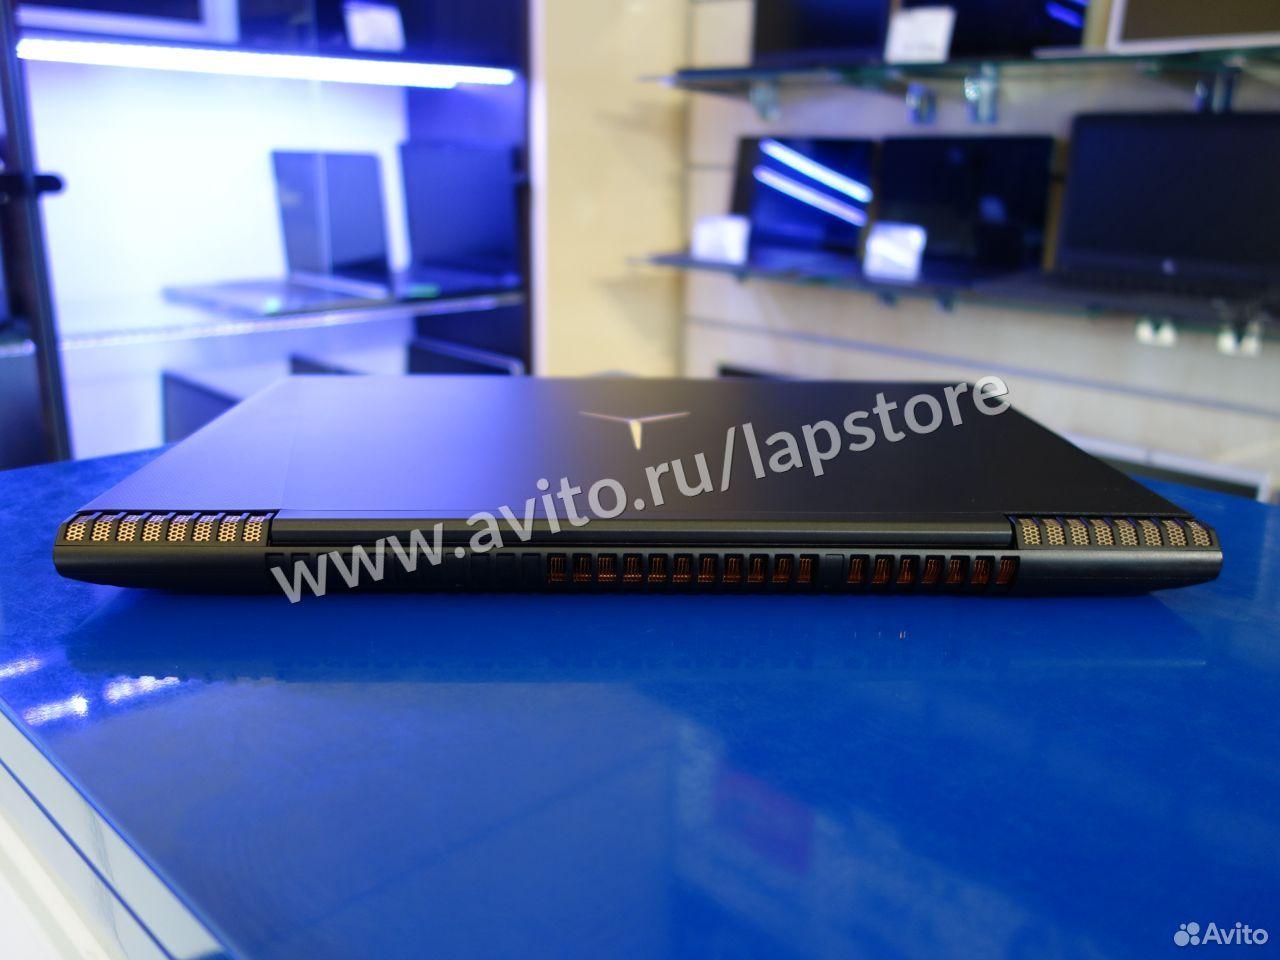 Ноутбук Lenovo Y520 i7-7700HQ/16GB/256+1T/GTX1050  84012422018 купить 8